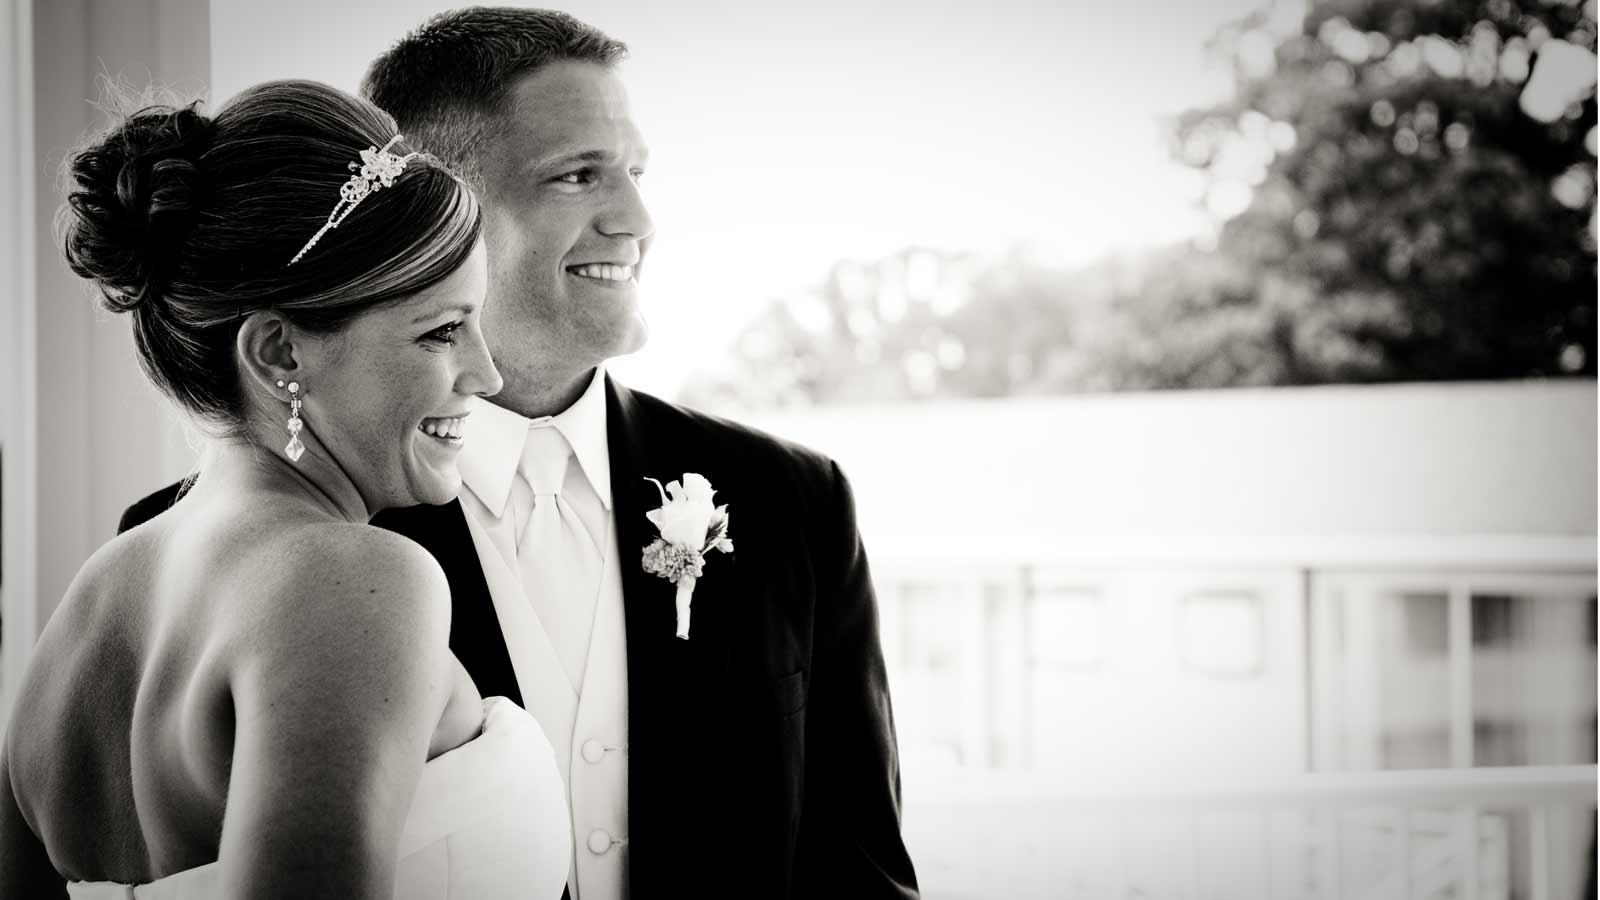 photography candid wedding photography